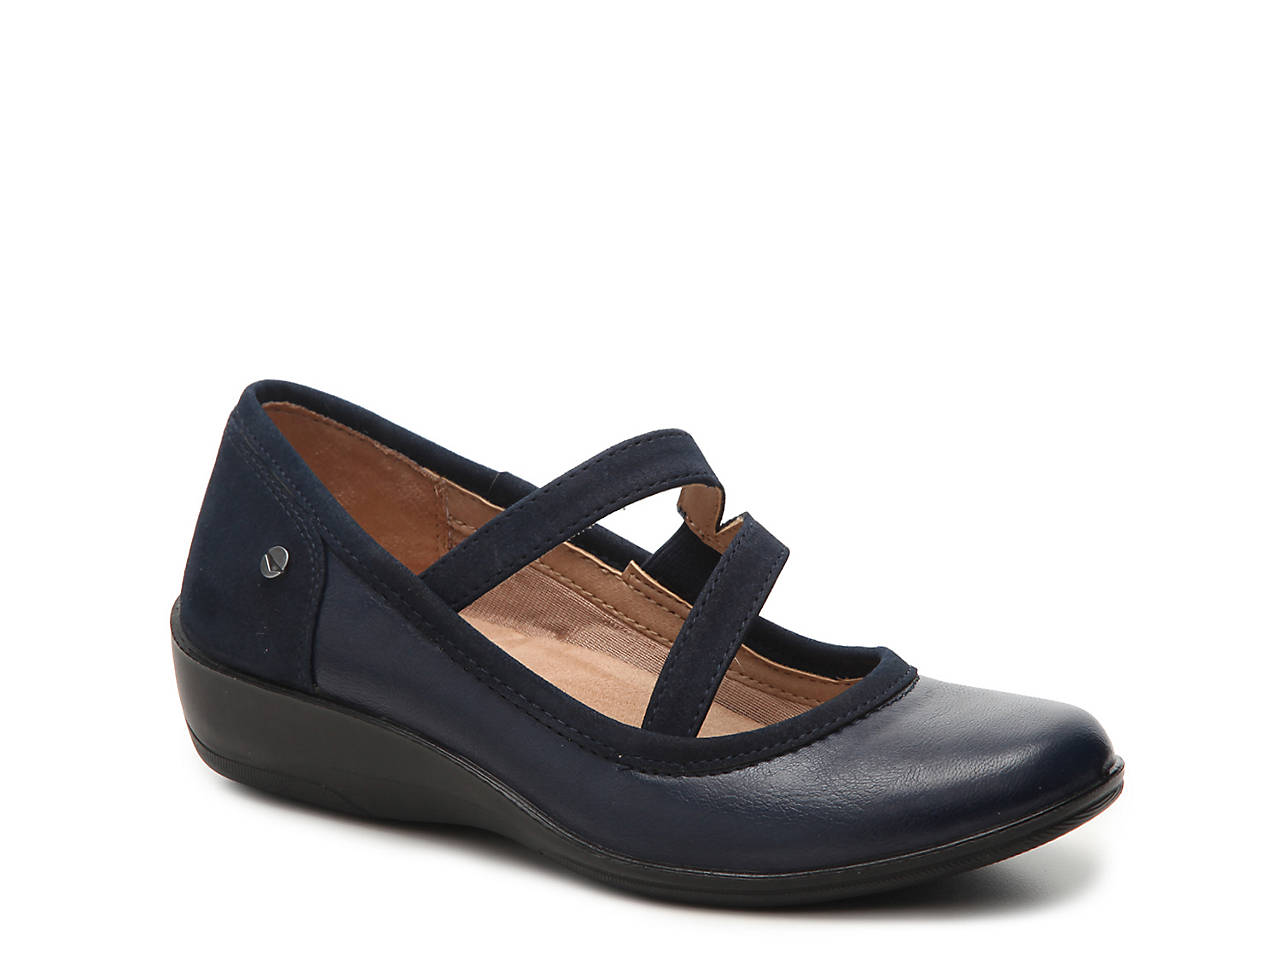 0debafbd0 LifeStride Indira Wedge Slip-On Women s Shoes